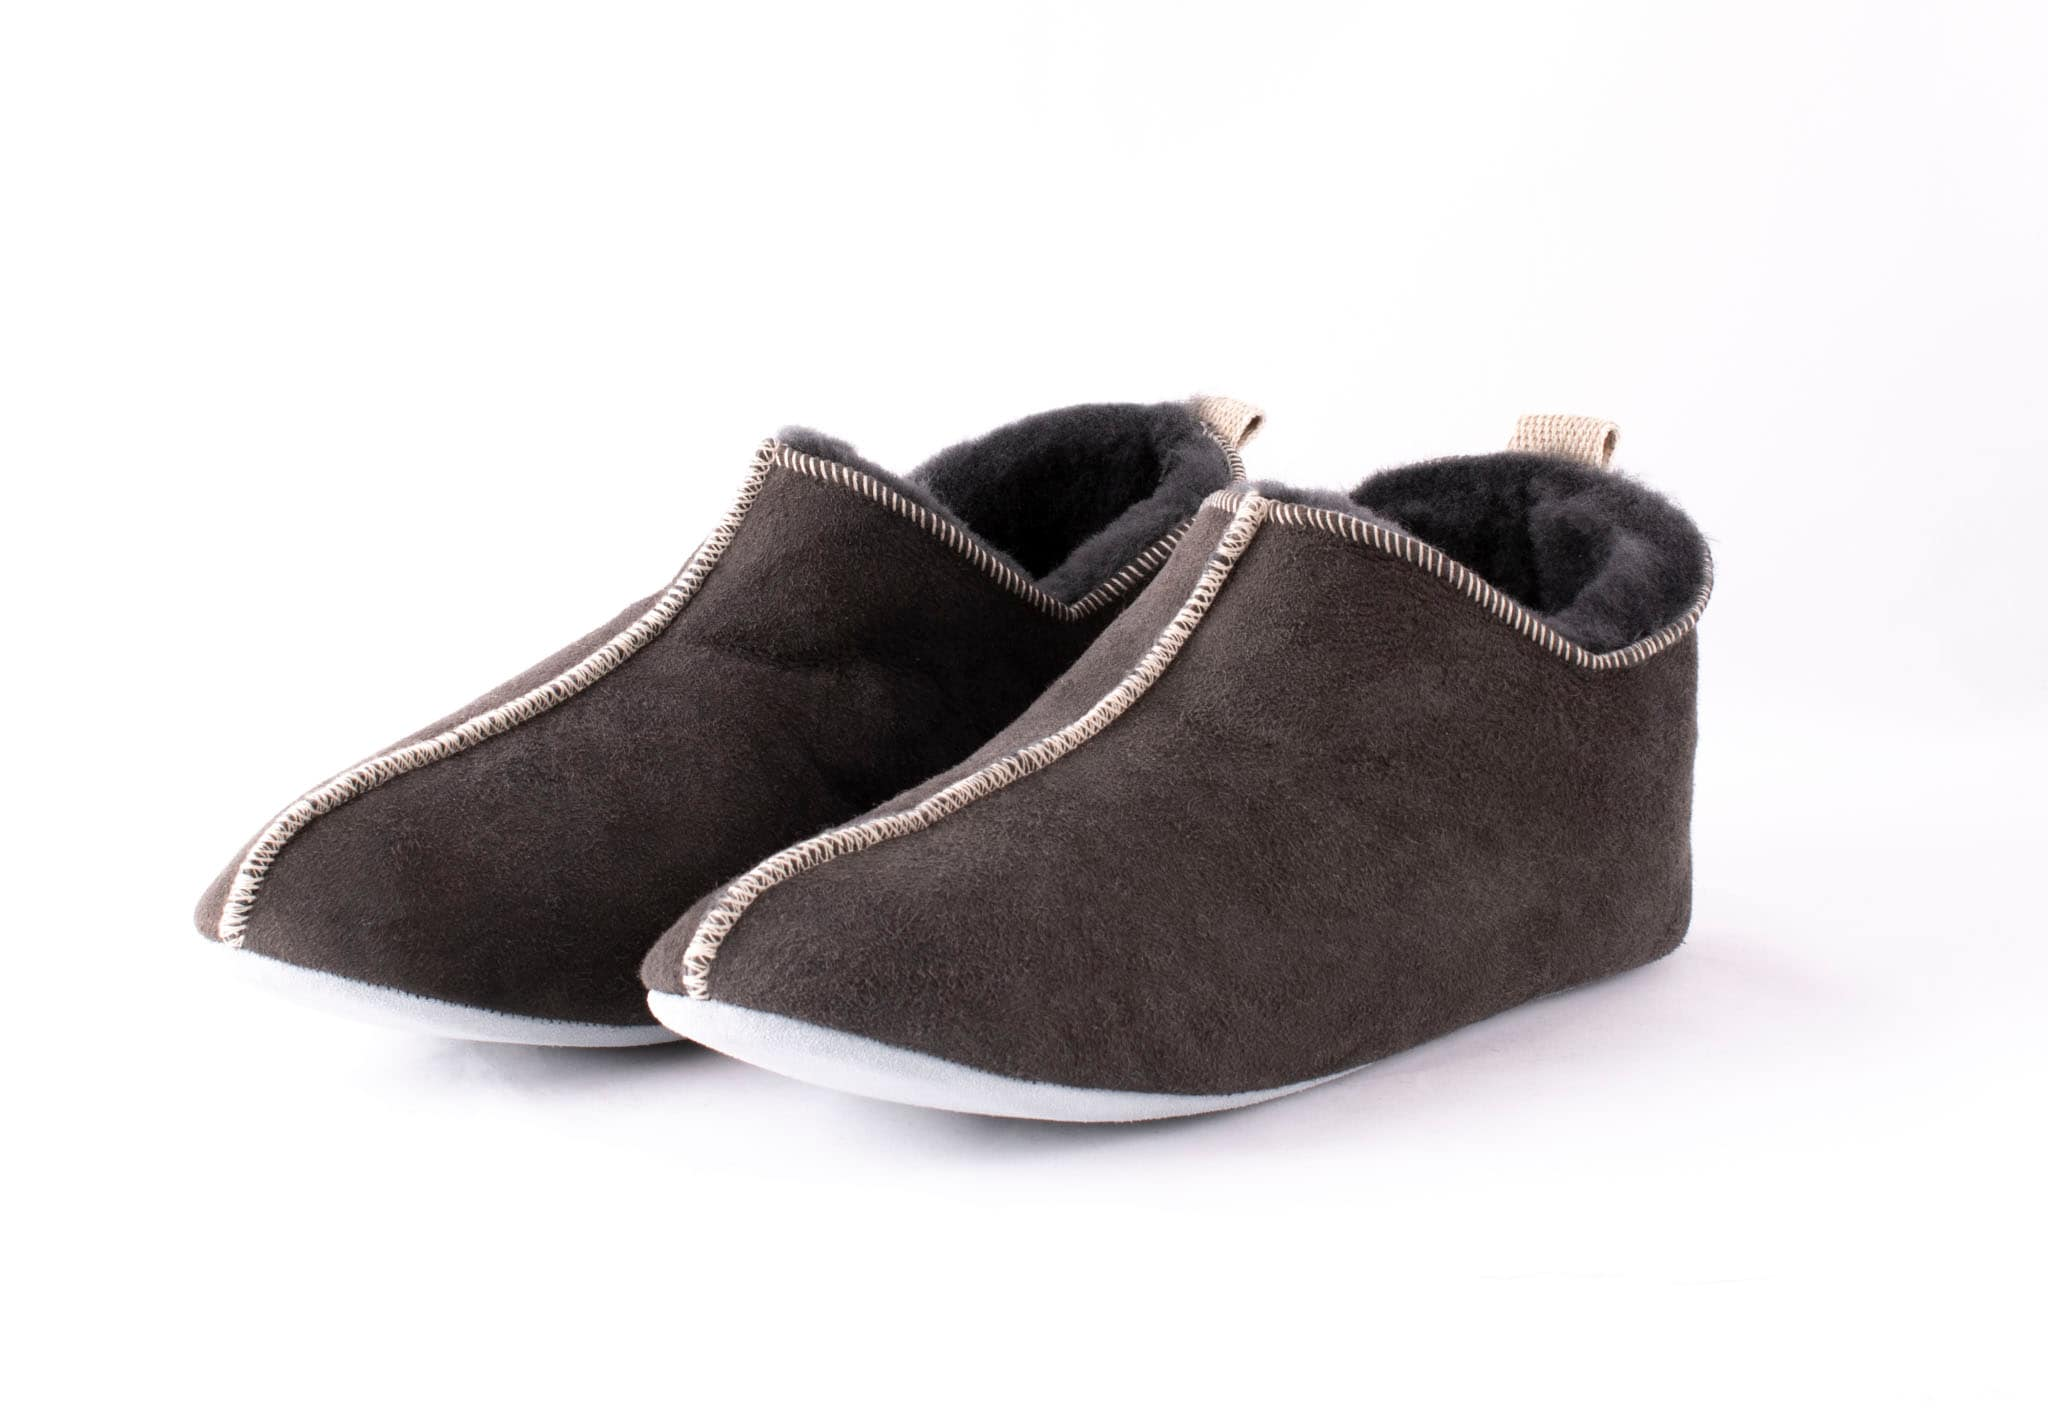 Anders slippers